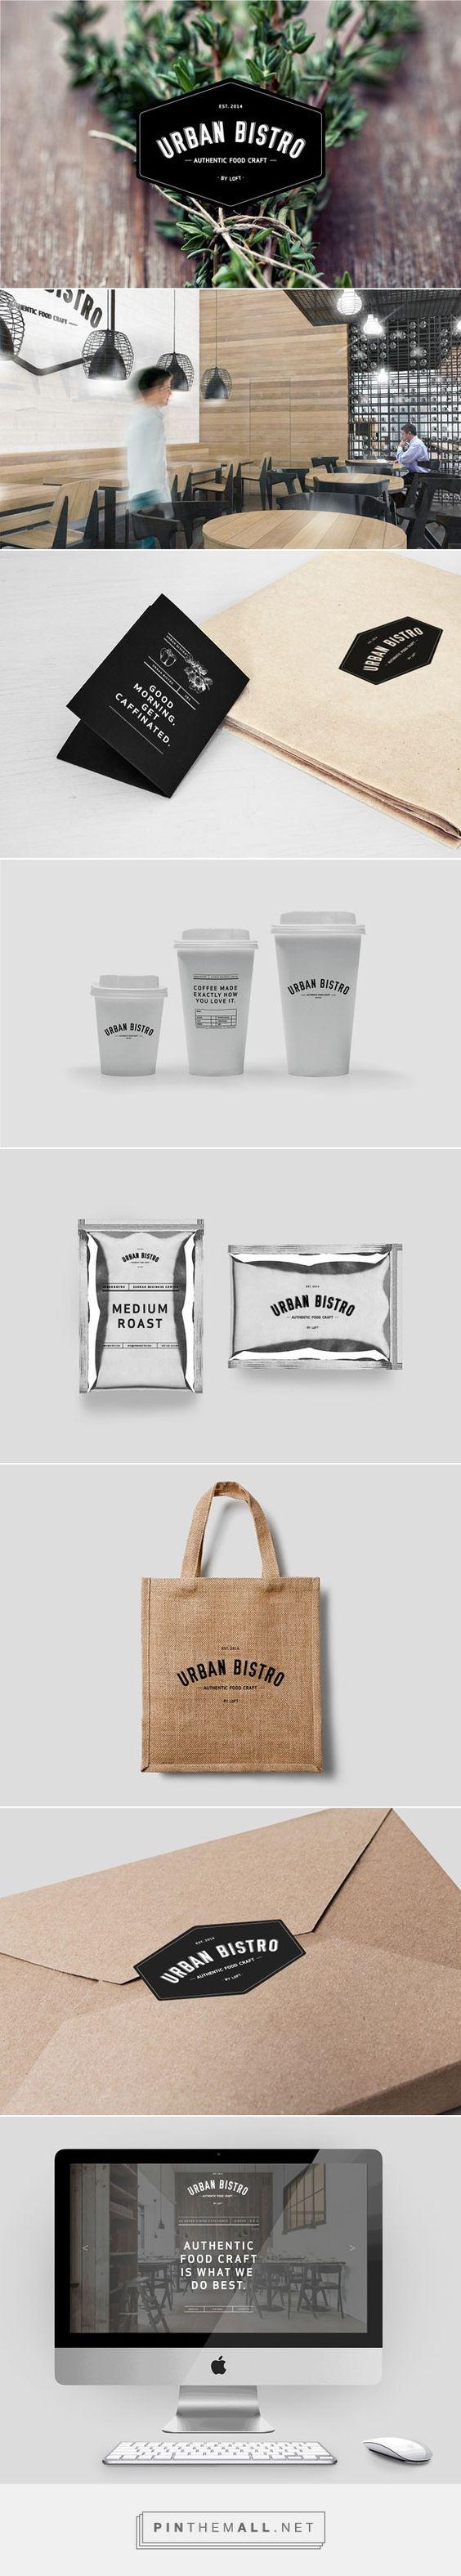 identity / Urban Bistro - Branding by Slash